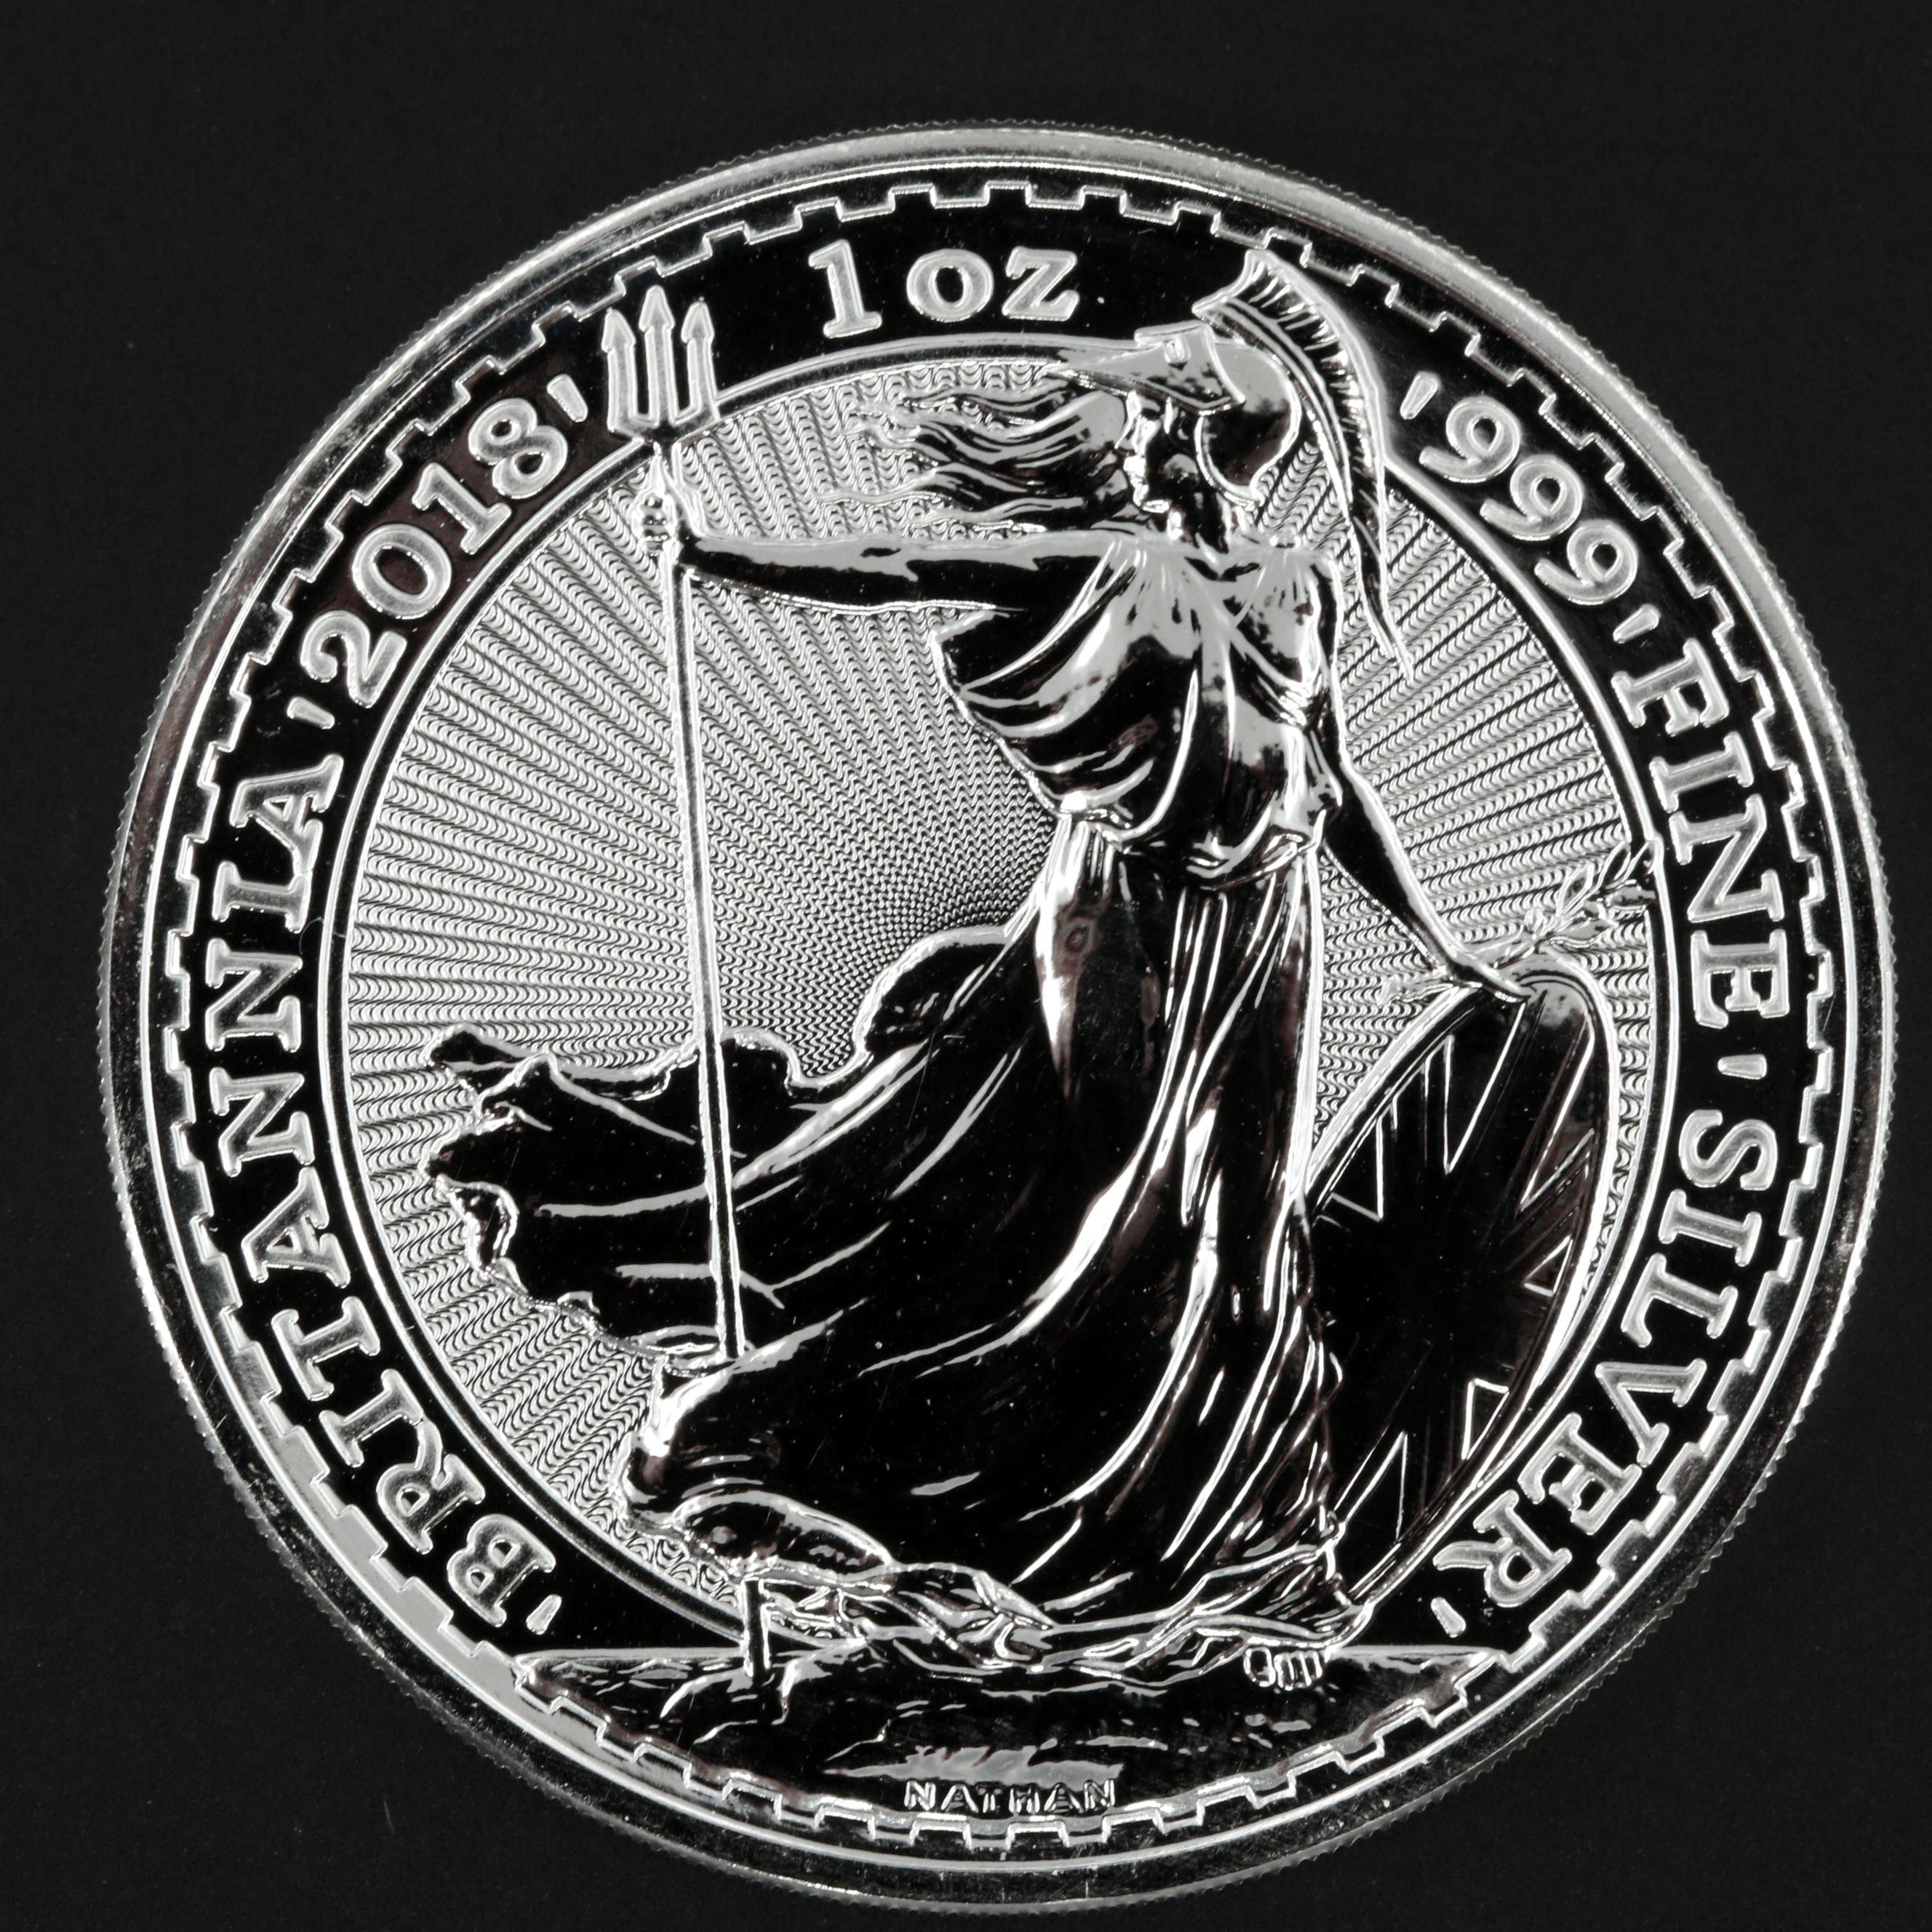 2018 Two Pound Britannia Silver Coin